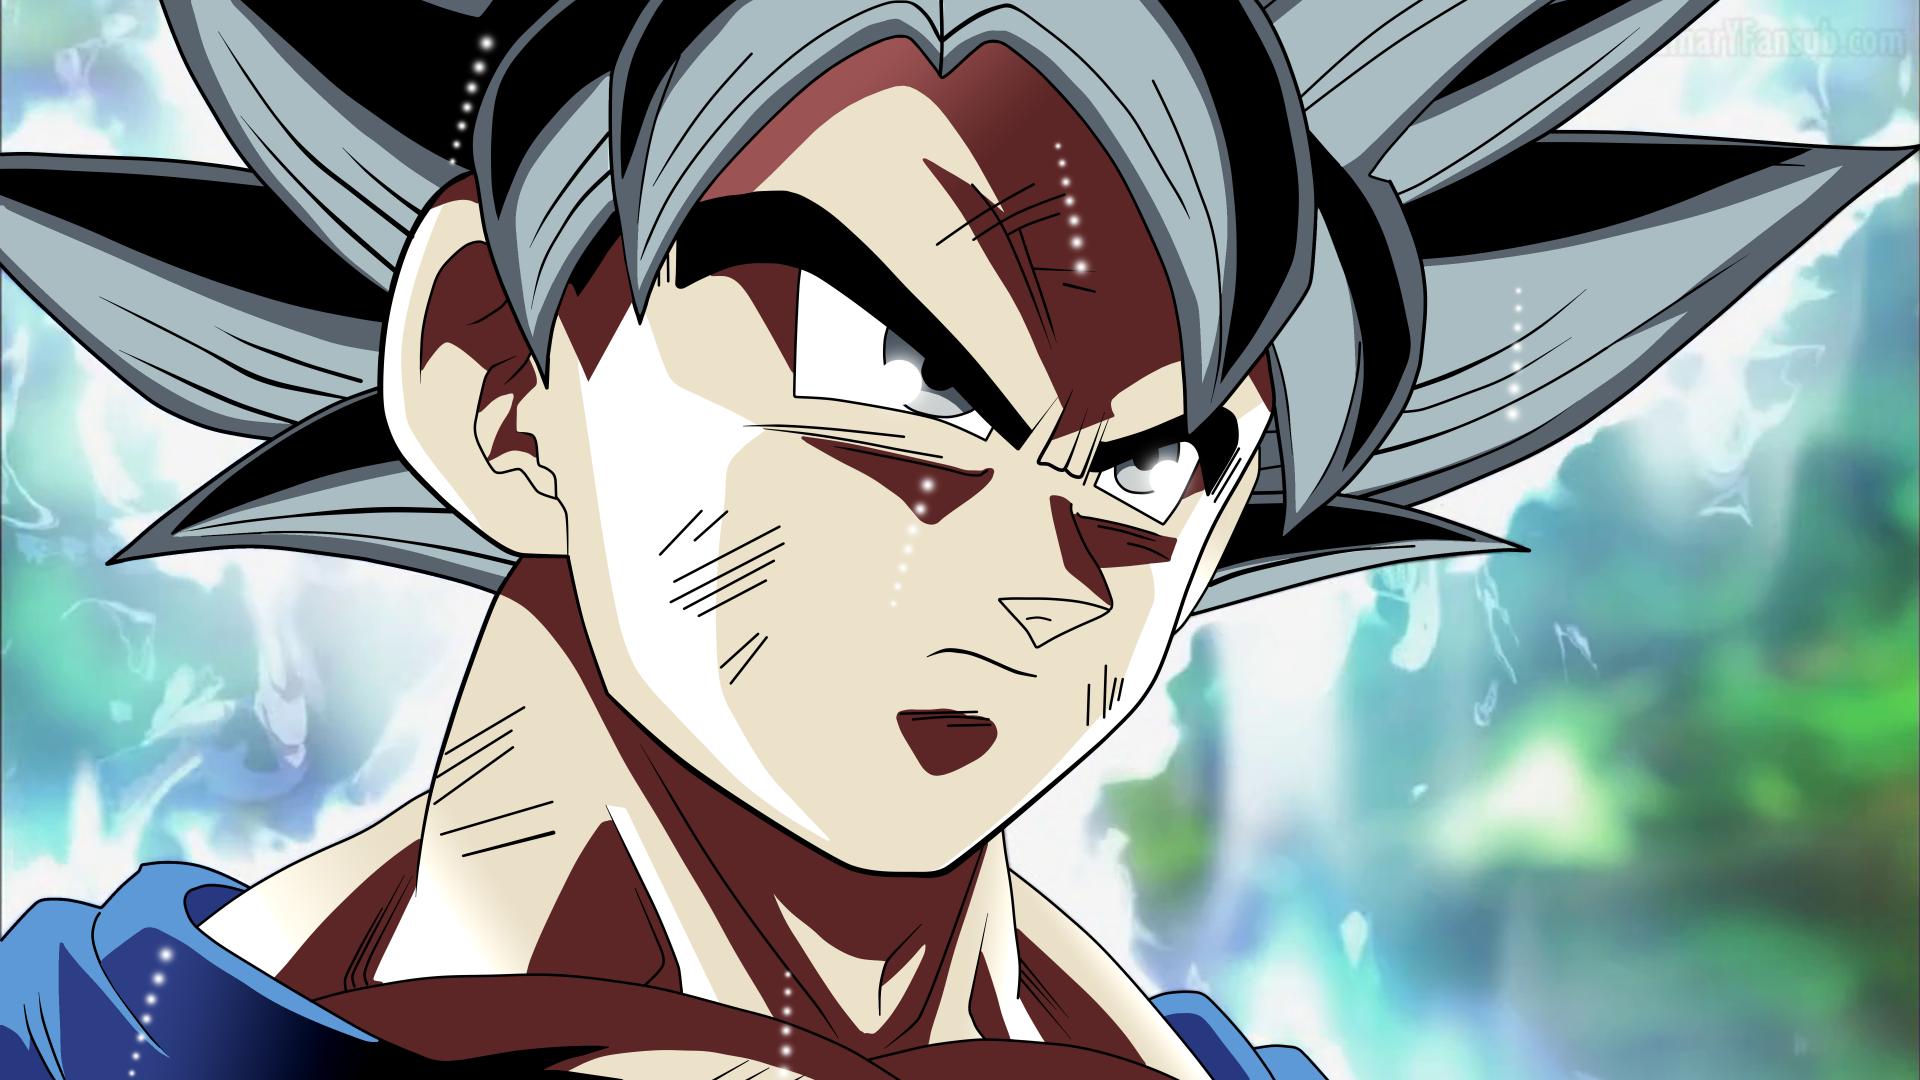 Goku migatte no gokui 5k retina ultra hd fondo de pantalla for Fondo de pantalla dragon ball super